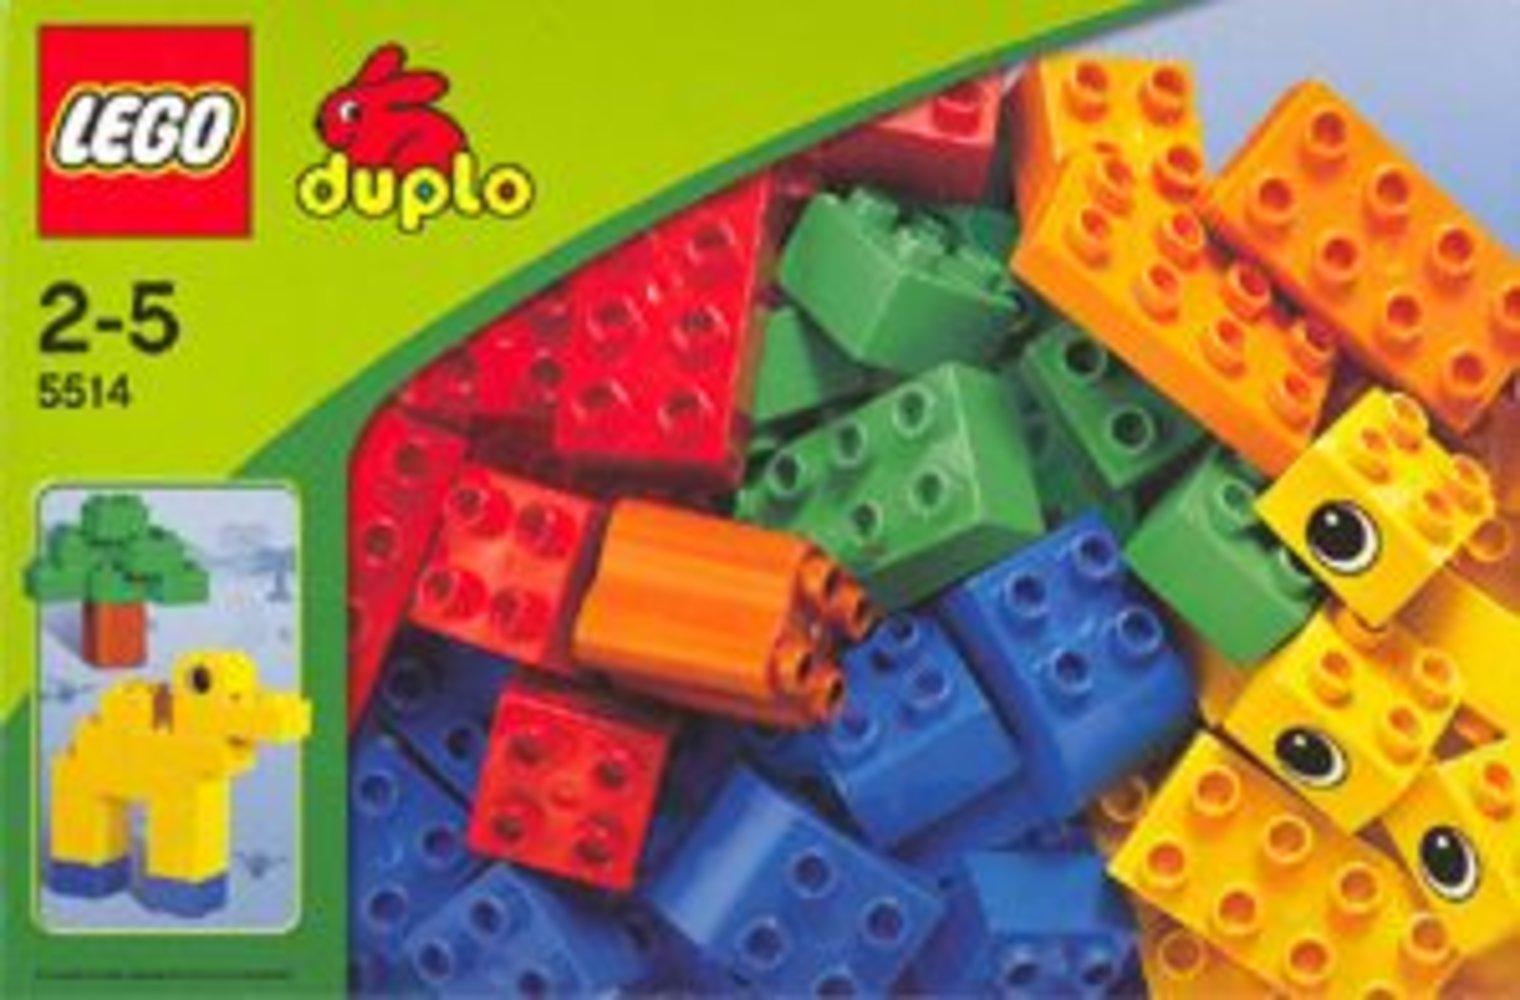 Fun Building with Lego Duplo